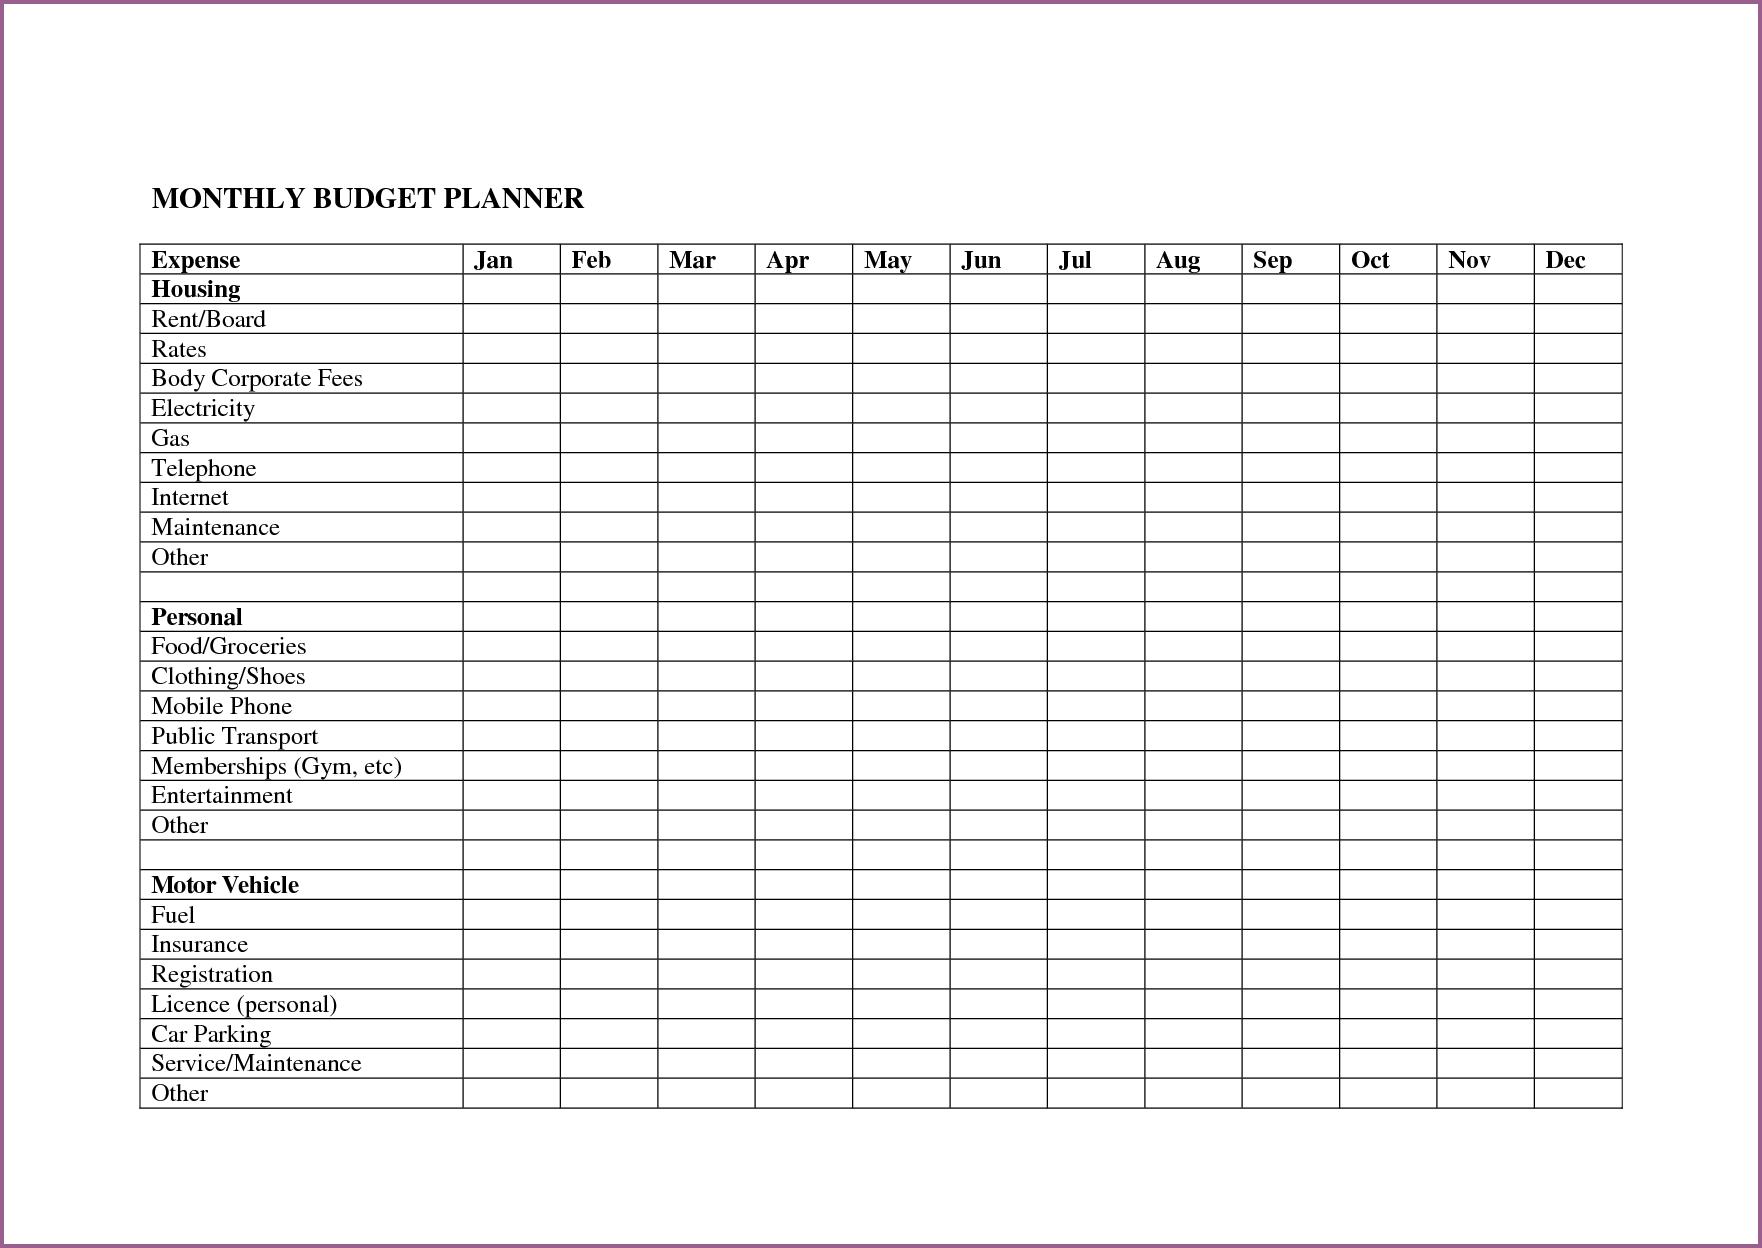 A Sample Budget Spreadsheet